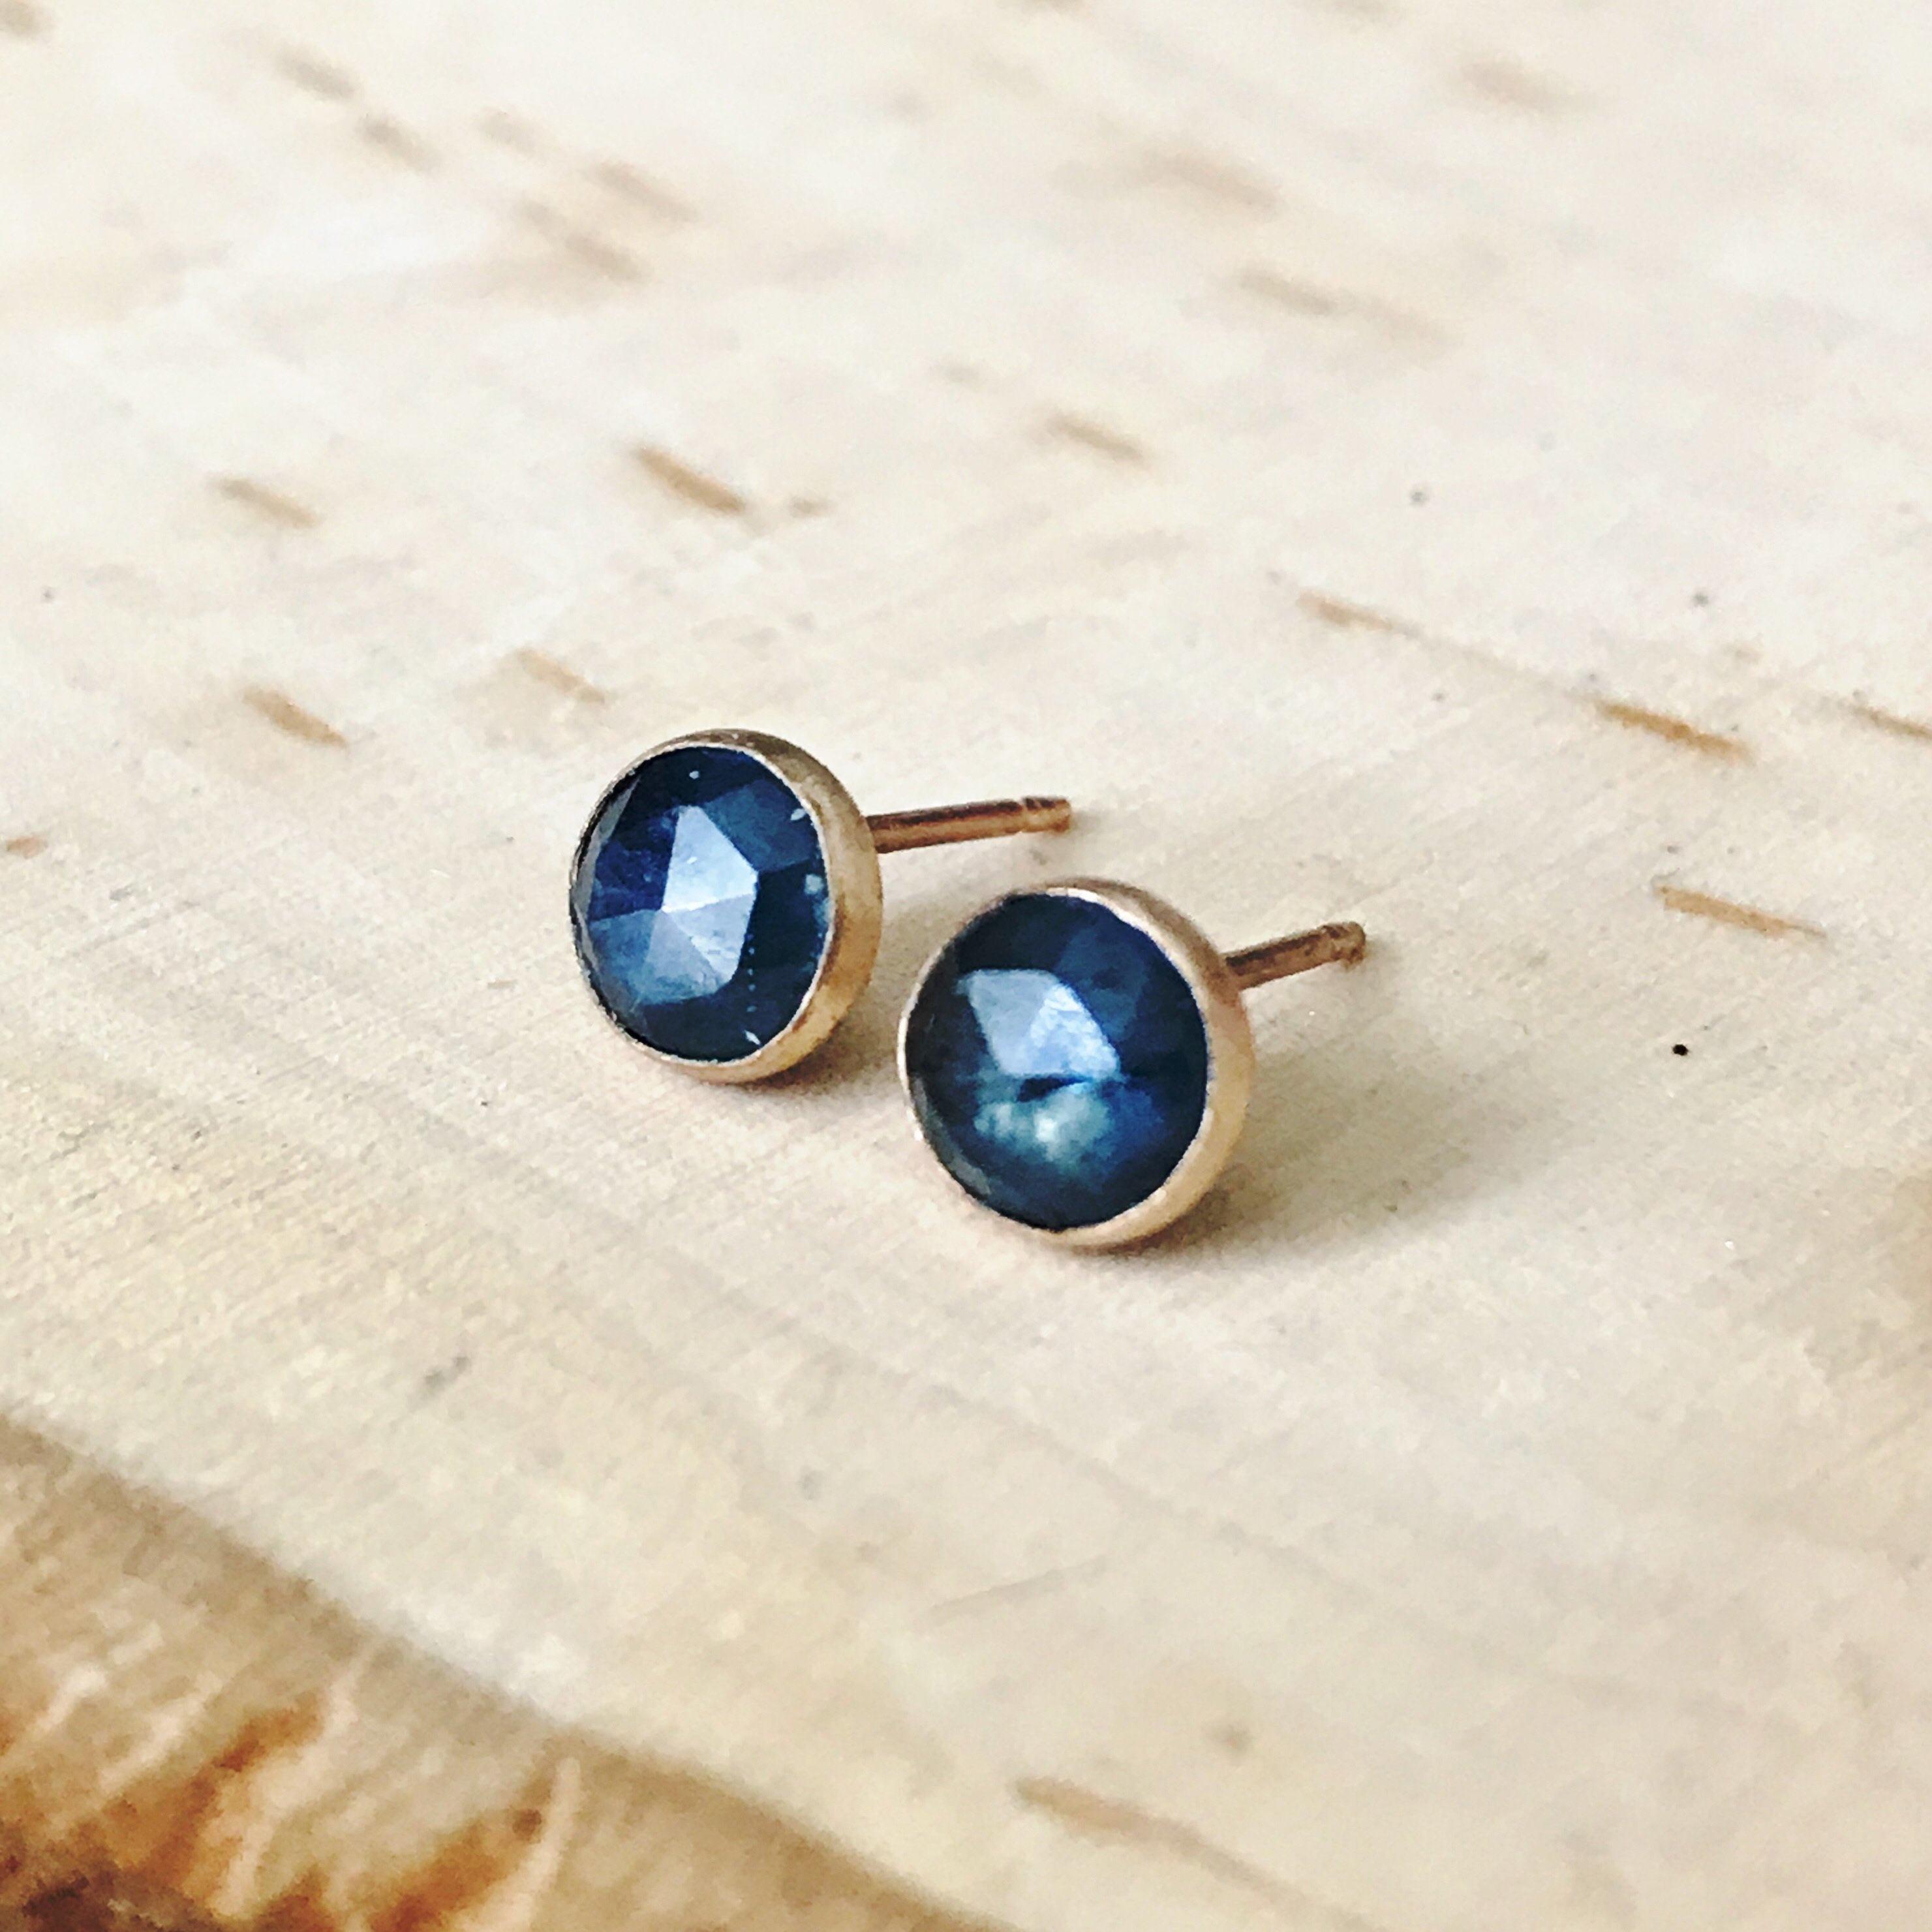 rose cut blue sapphire stud earrings 4mm 6mm sapphire. Black Bedroom Furniture Sets. Home Design Ideas